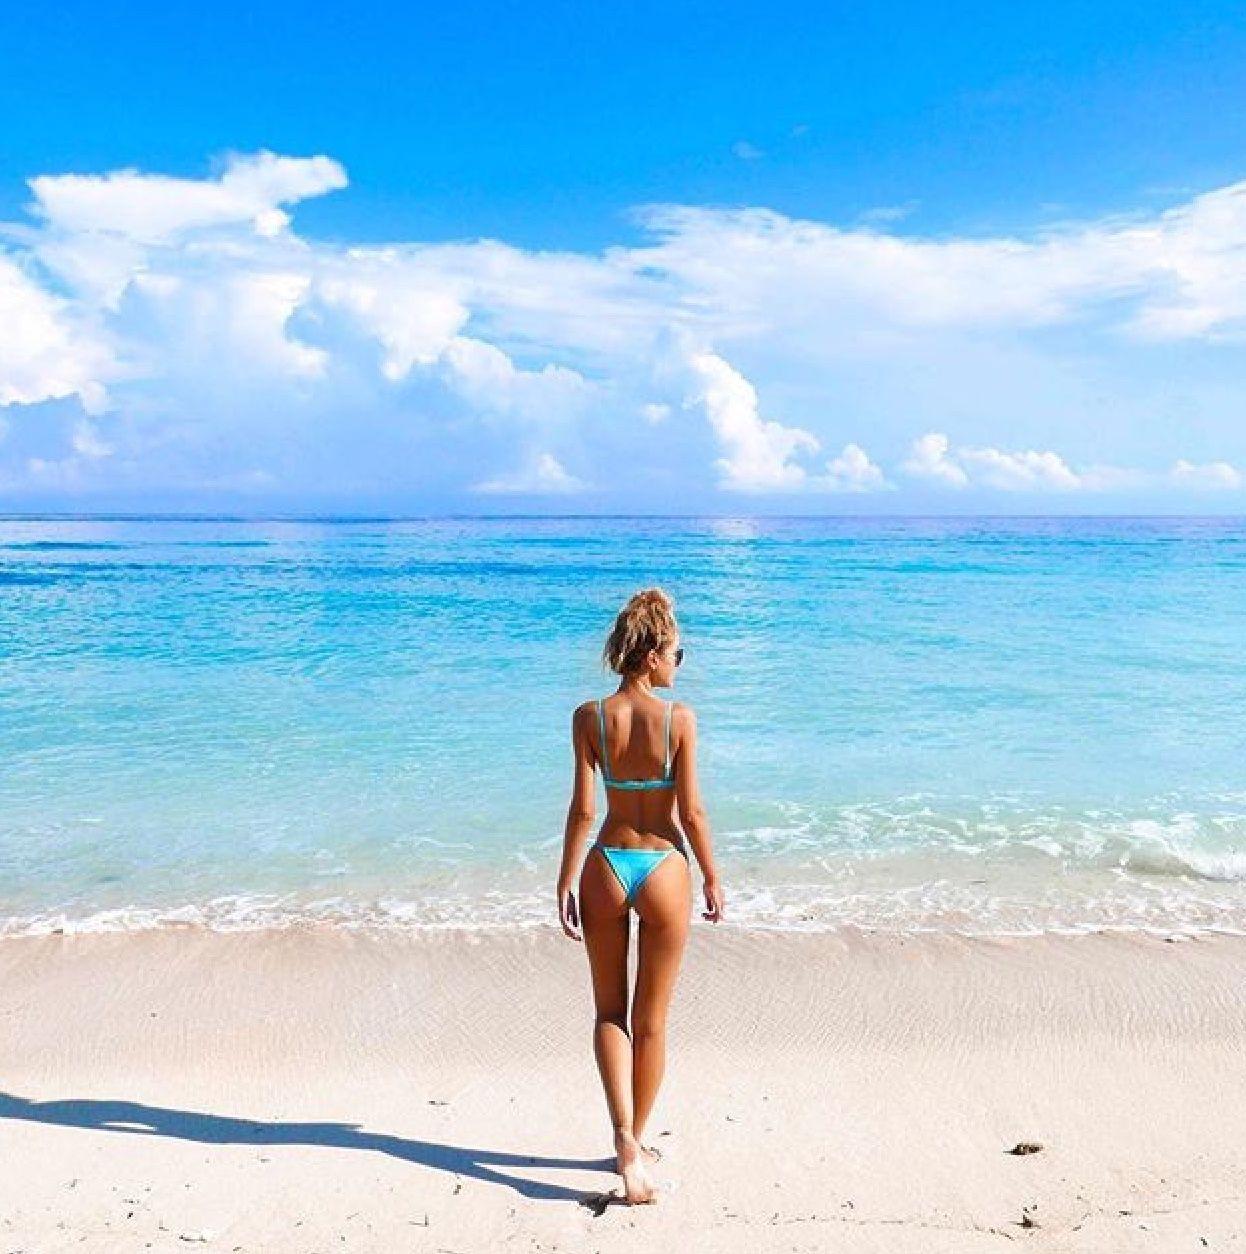 Summer beach girls pictures, mature lingerie pics